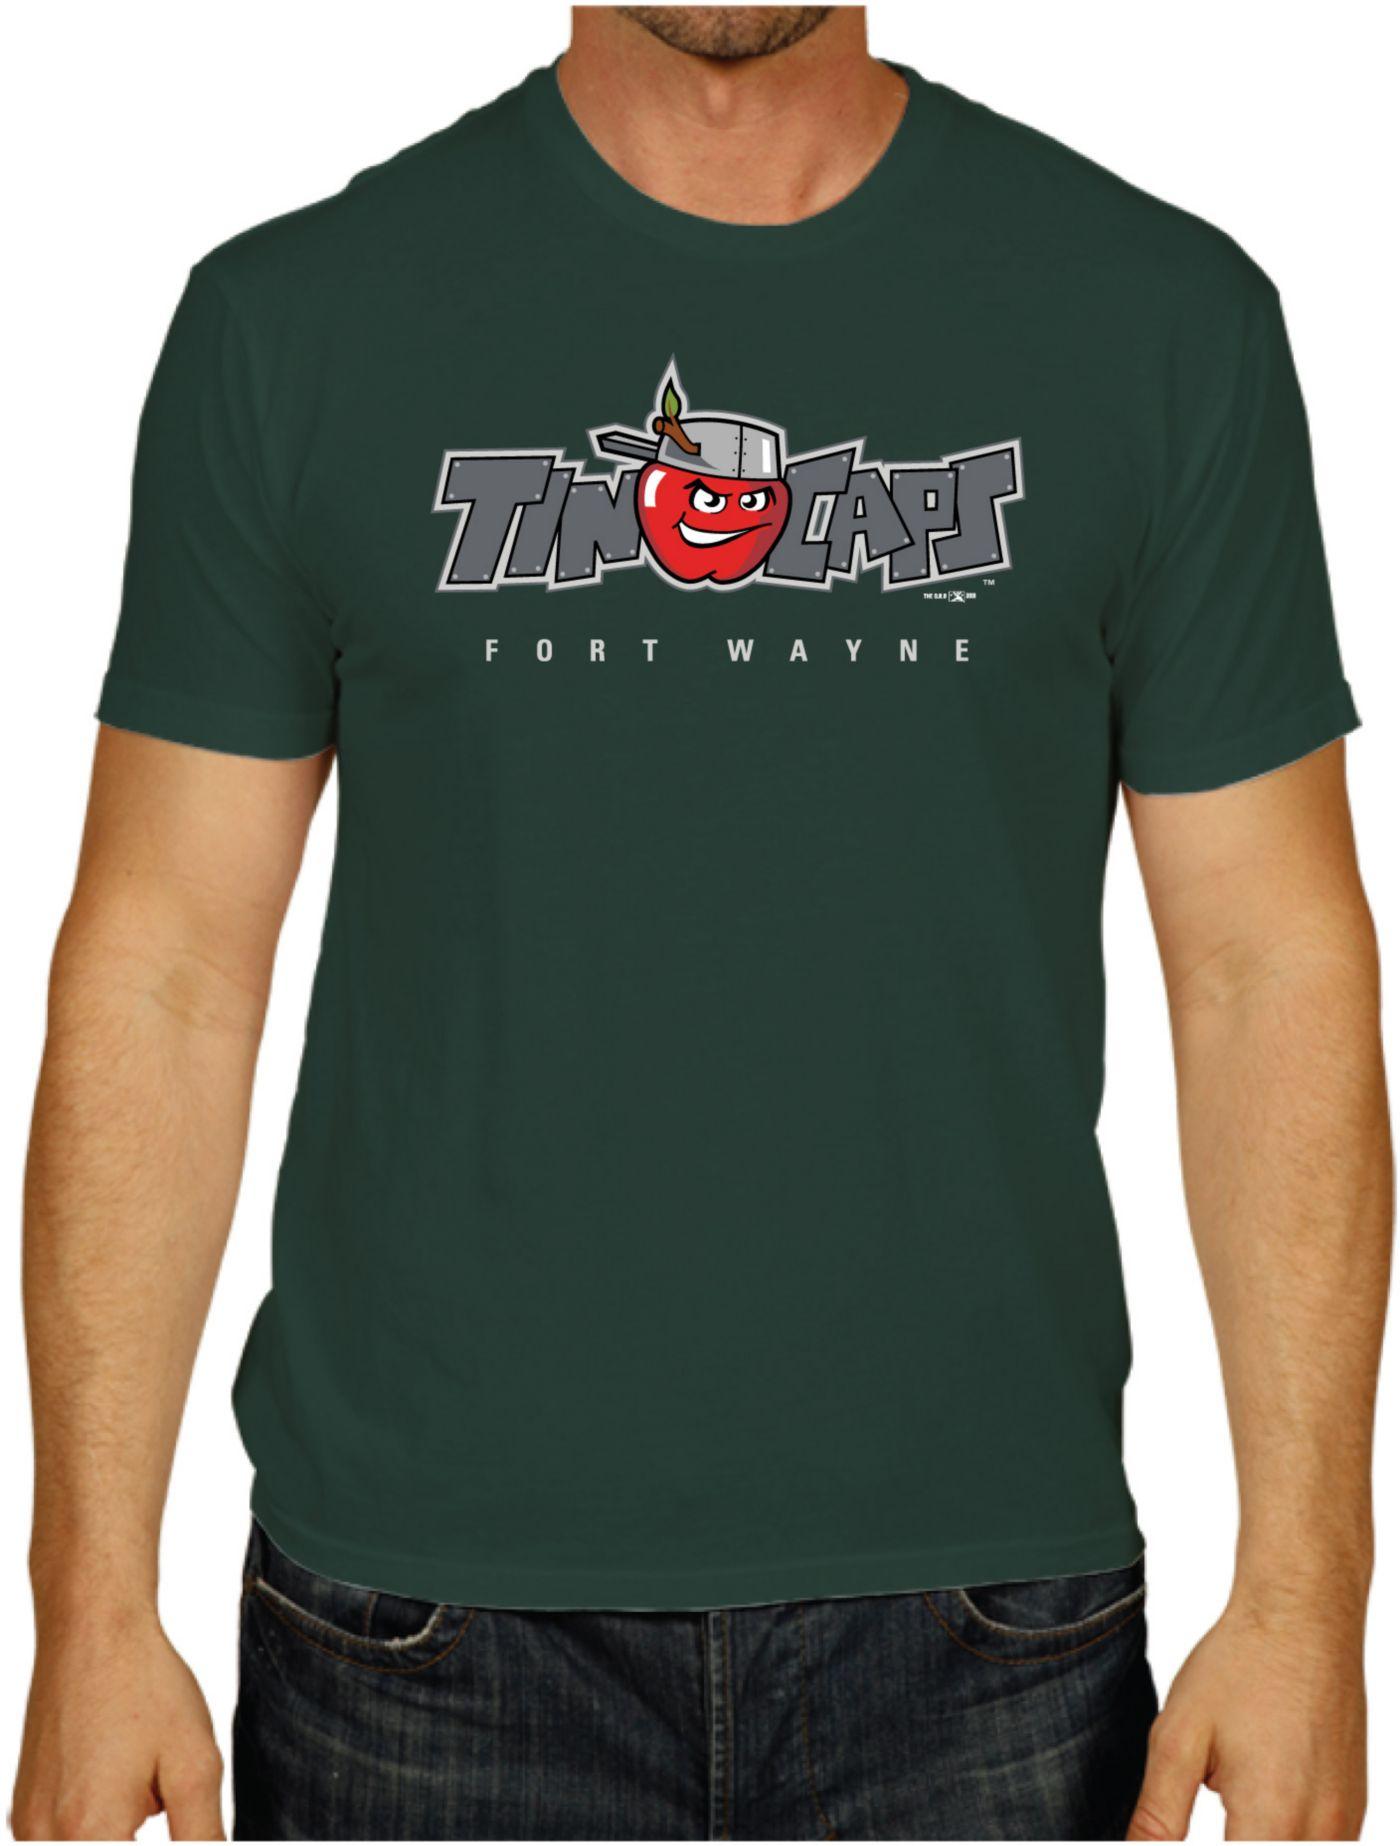 The Victory Men's Fort Wayne Tincaps T-Shirt